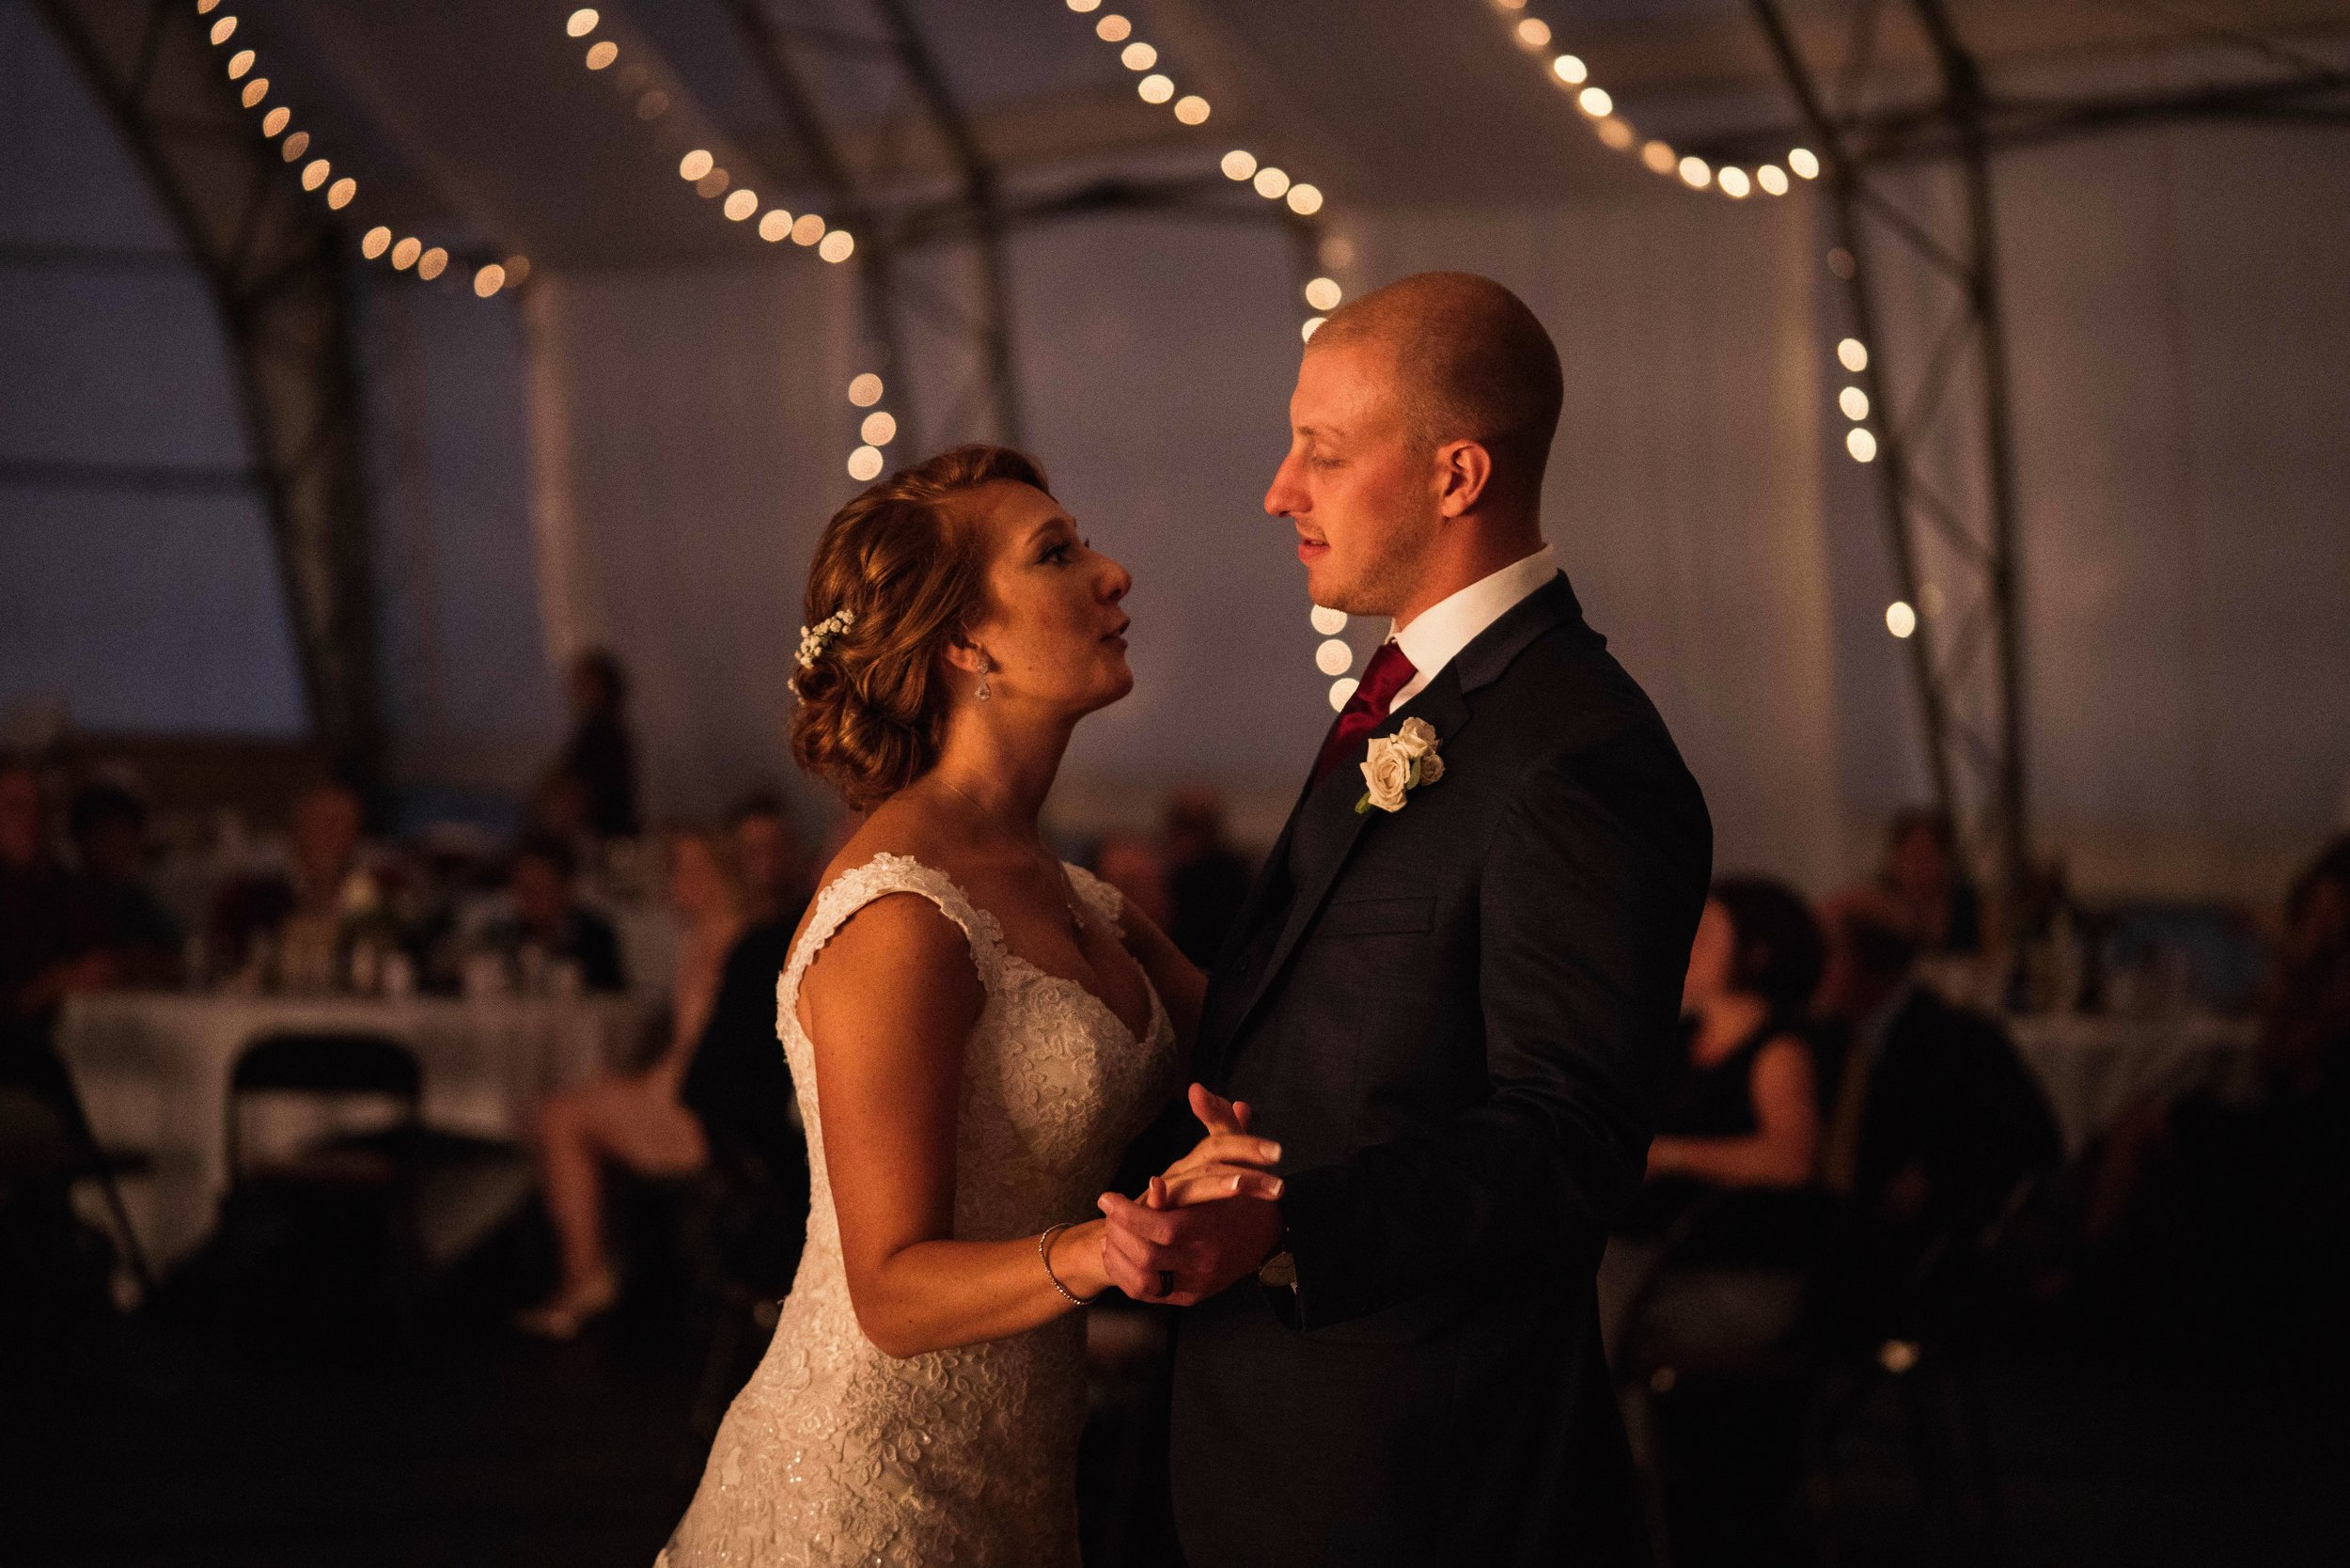 Blog-Lisa-James-Wedding-at Rosebud Estate Weddings in Arcade NY by Stefan-Ludwig-Photography-Buffalo-NY-71-x.jpg